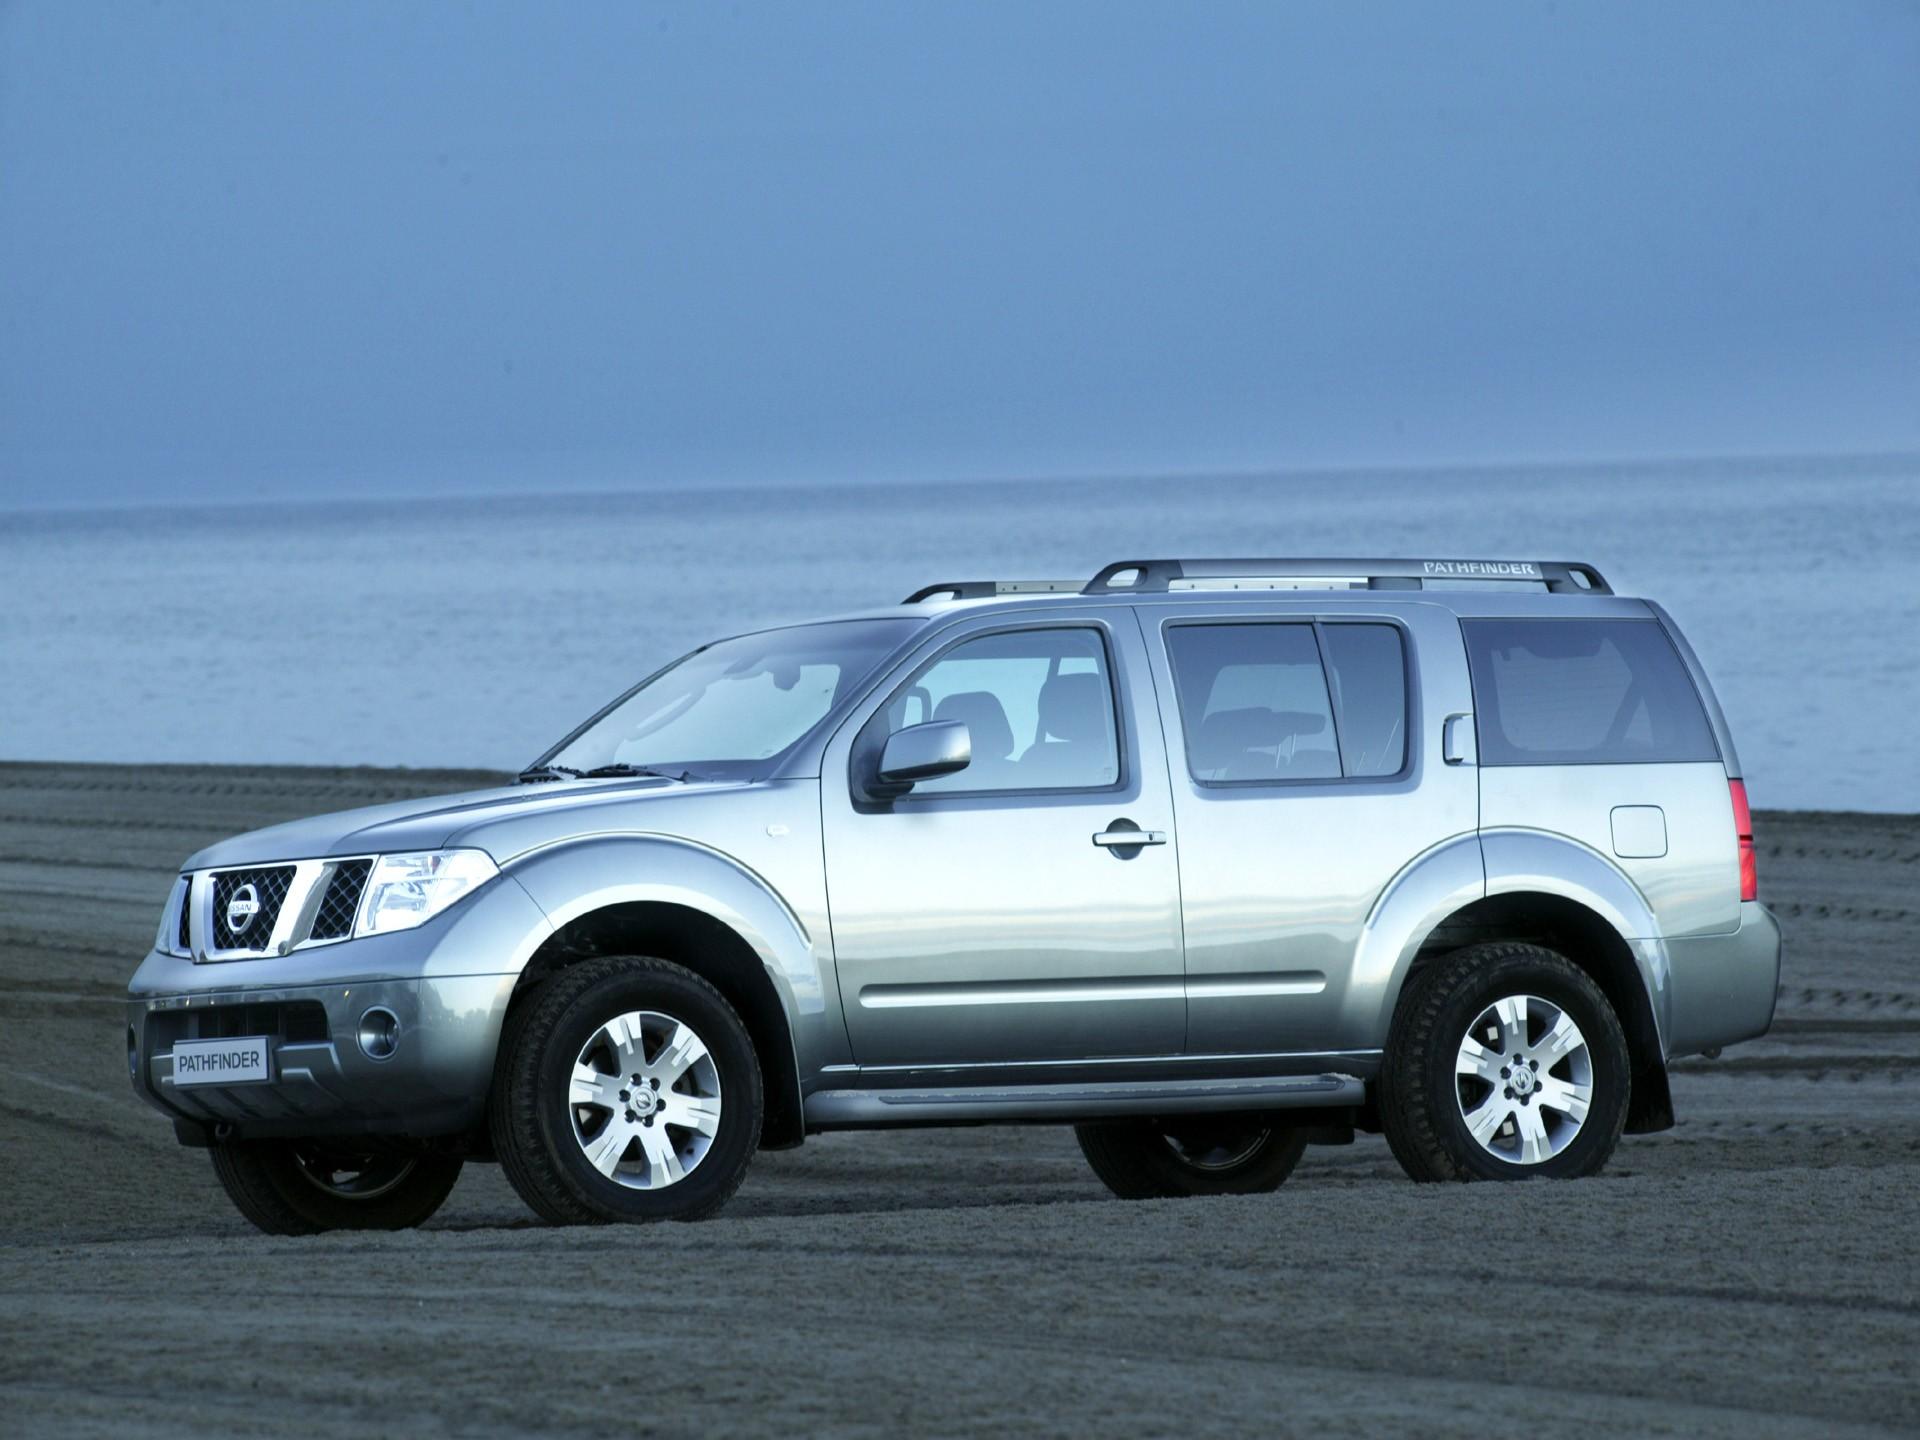 2012 Nissan Pathfinder Reviews >> NISSAN Pathfinder - 2007, 2008, 2009, 2010, 2011, 2012 - autoevolution